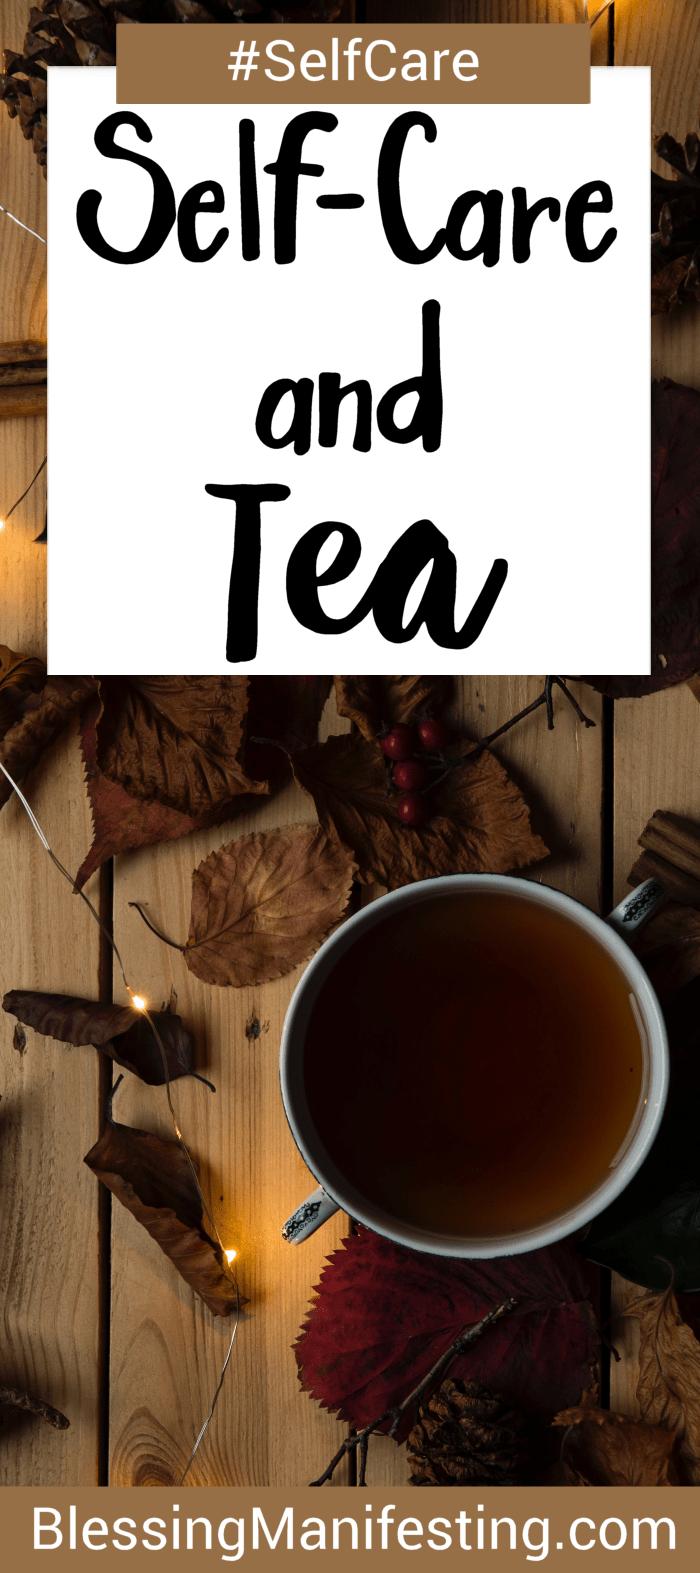 selfcare tea Tea rituals, Black coffee benefits, Self care